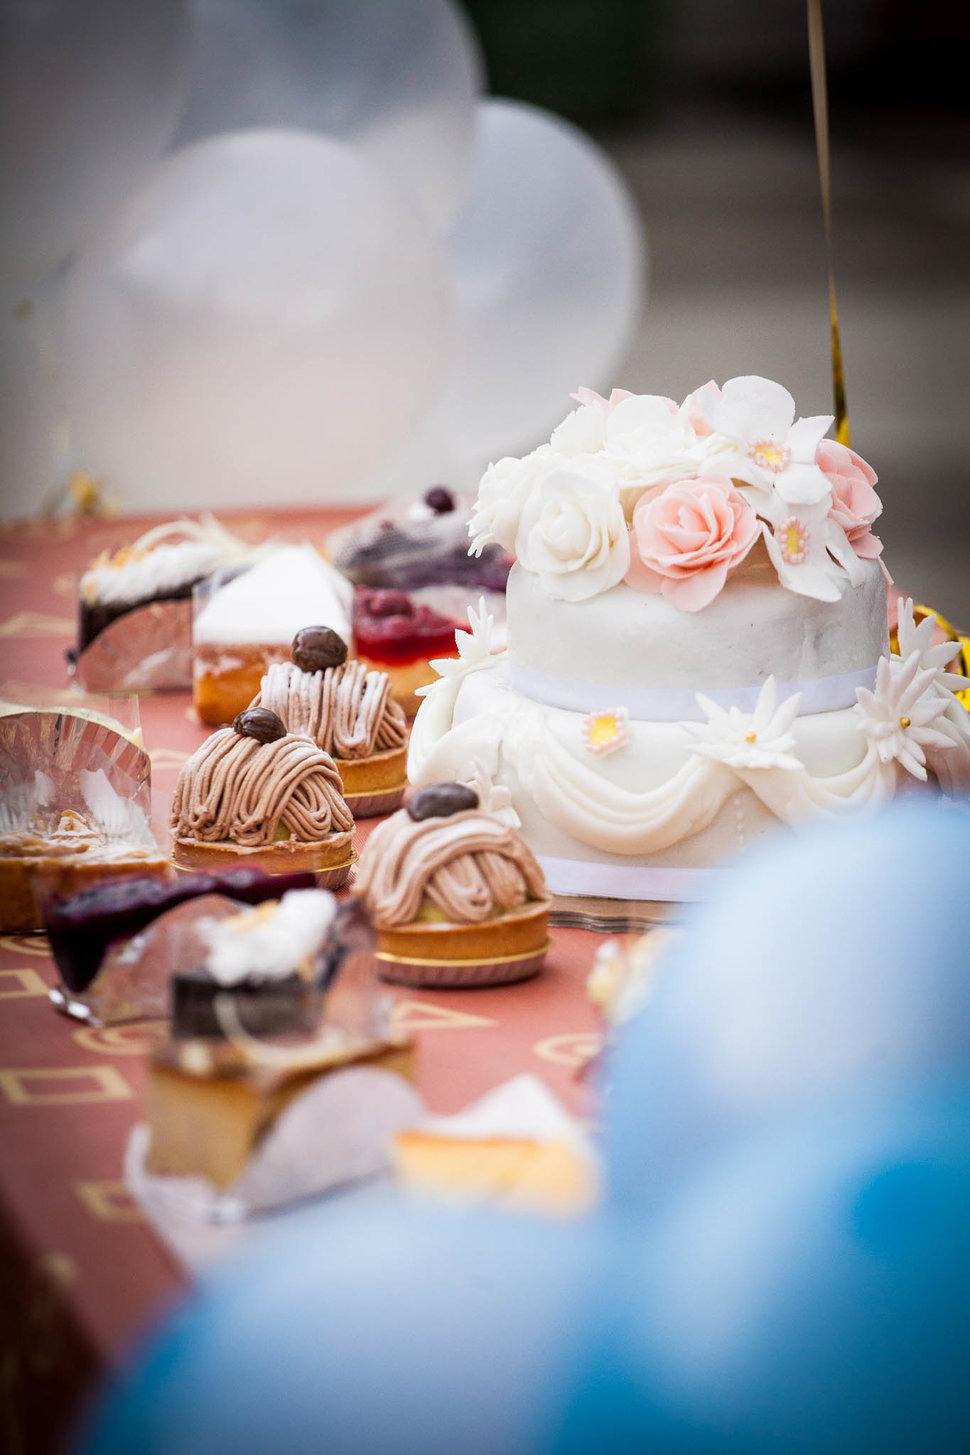 18PHOTO-大育❤️ 小汝(花園婚禮)(編號:226007) - 18PHOTO 婚紗影像攝影工作室 - 結婚吧